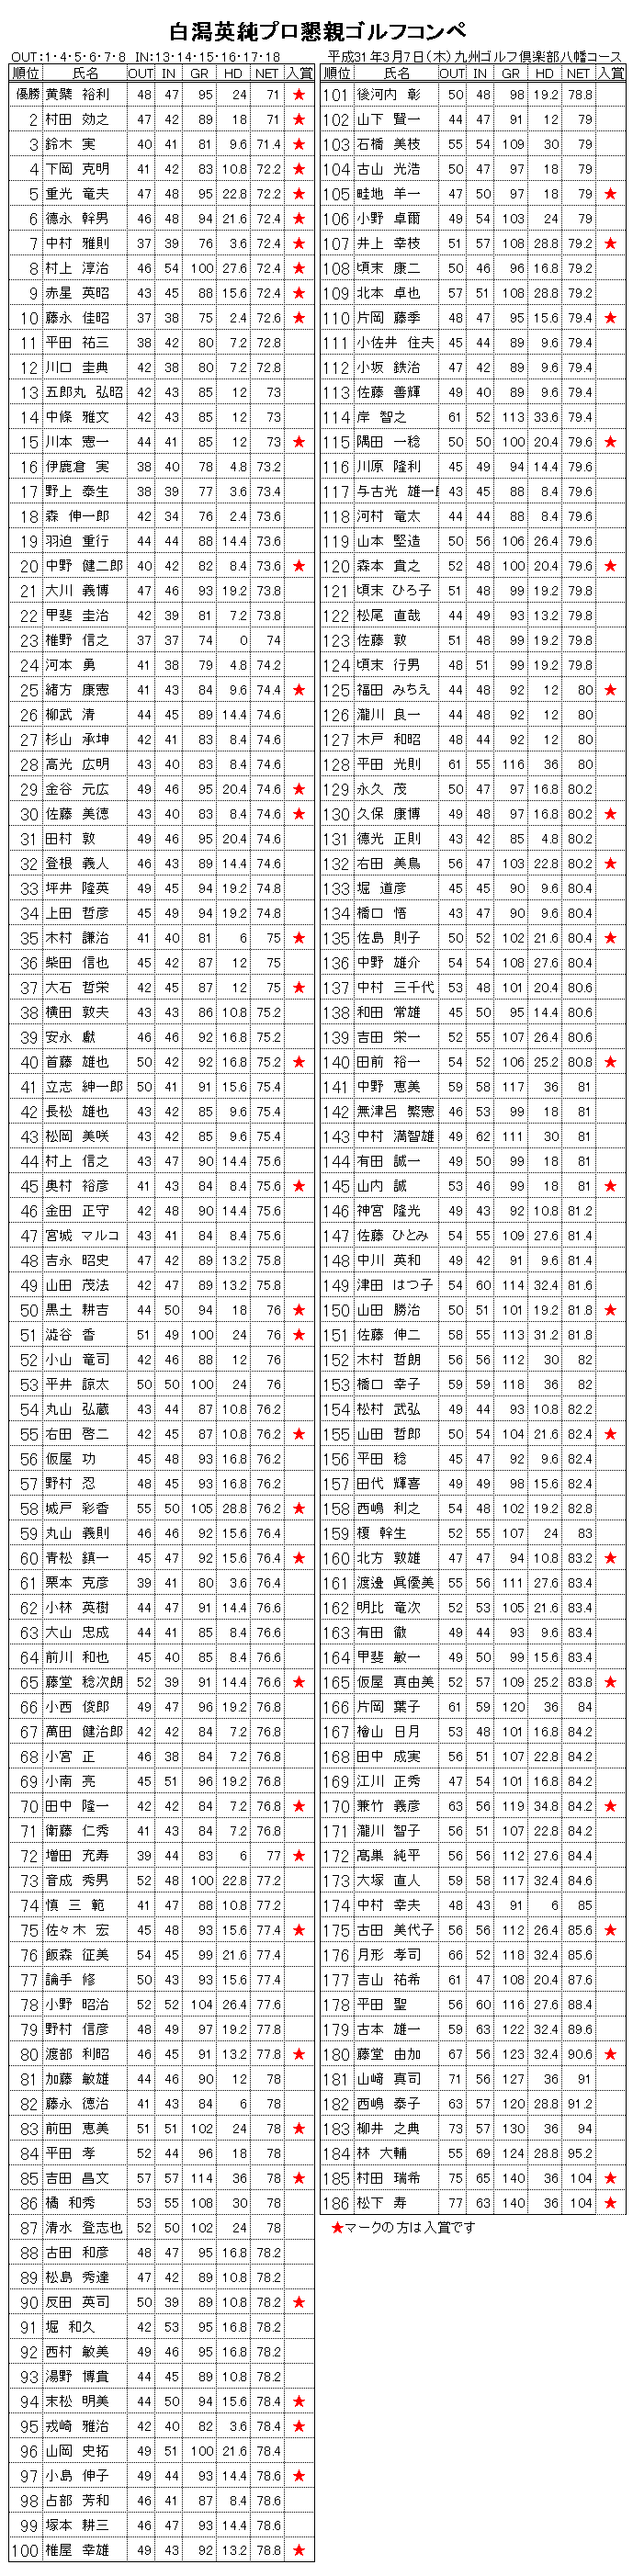 H31白潟プロコンペ成績.png